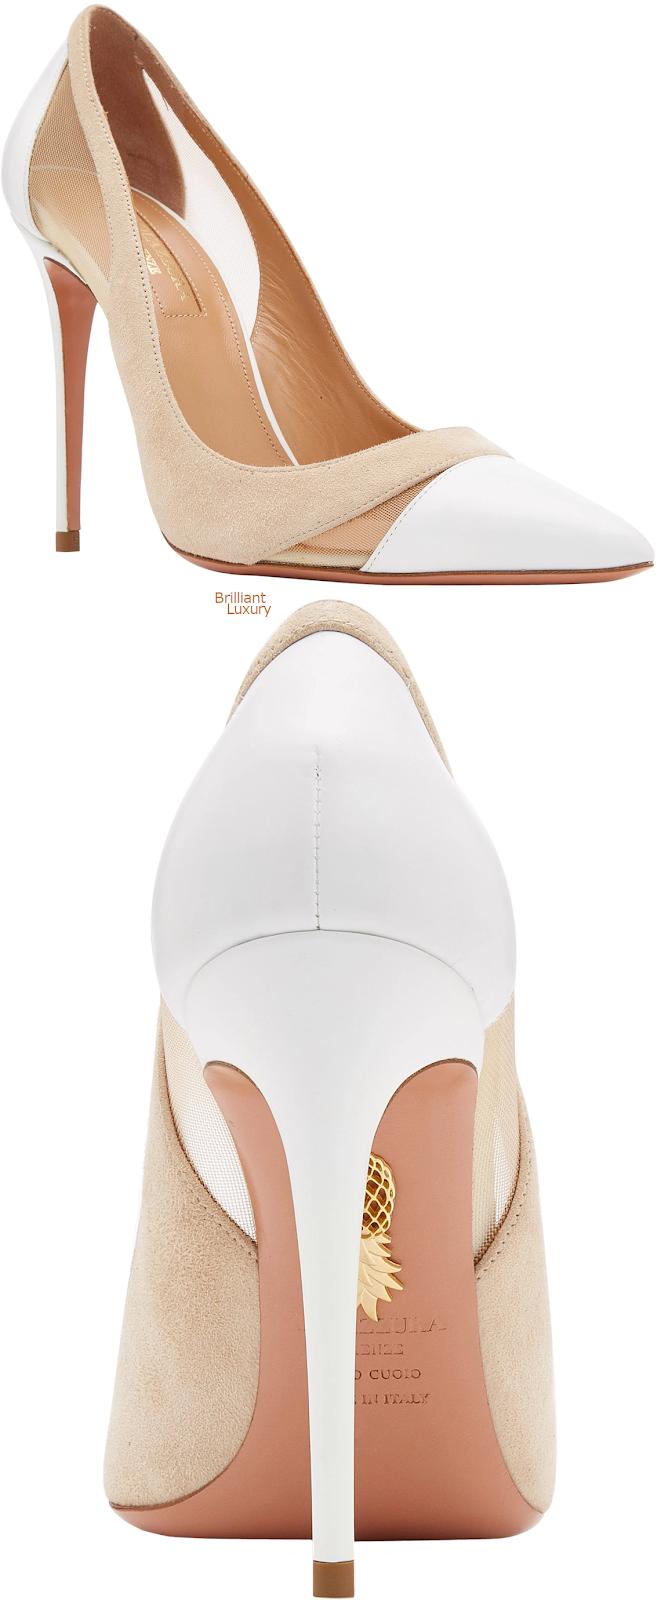 Brilliant Luxury♦Aquazzura Savoy leather mesh suede pumps